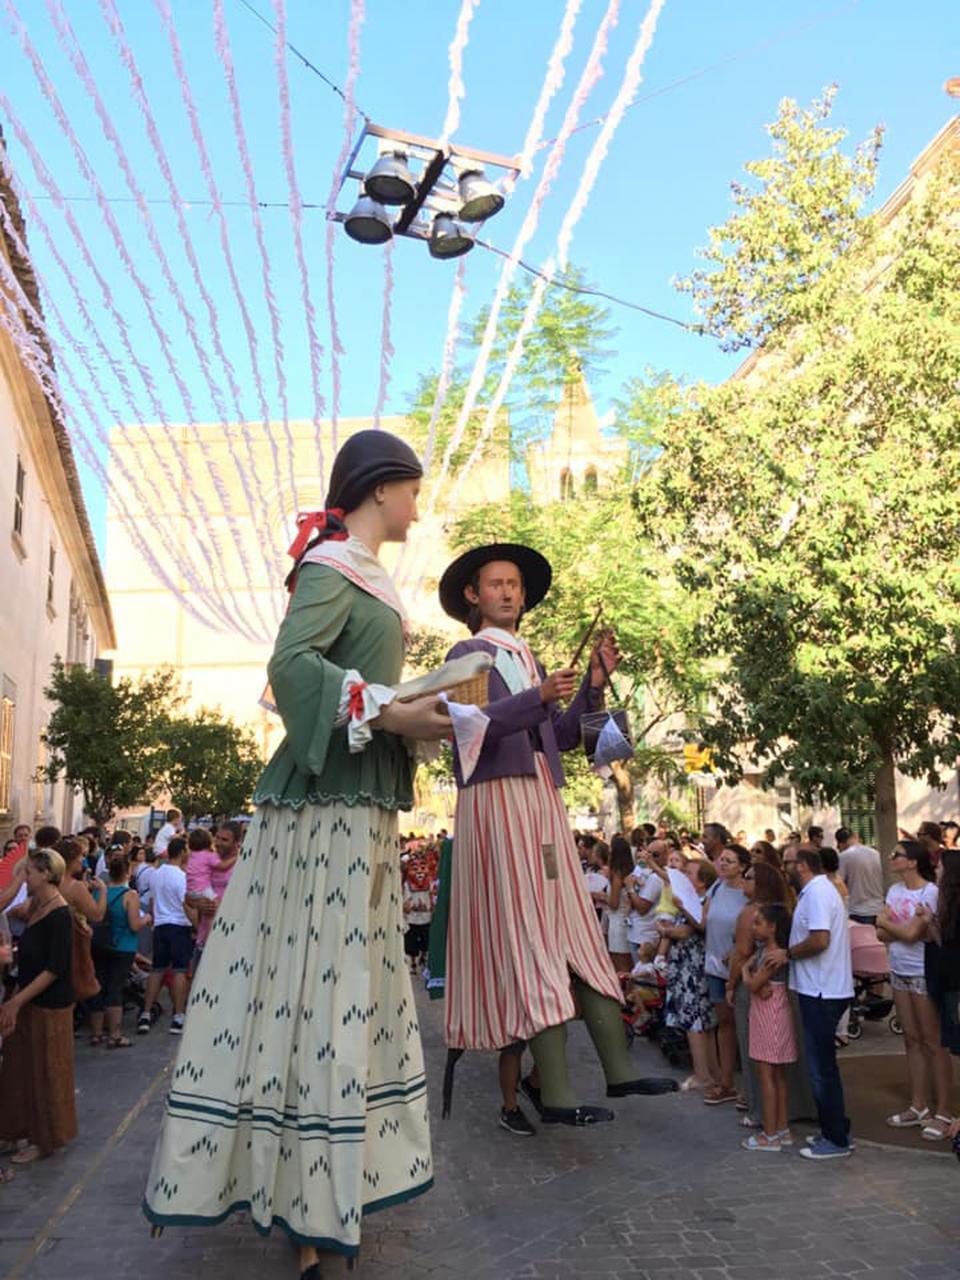 The Sant Roc fiestas in Porreres